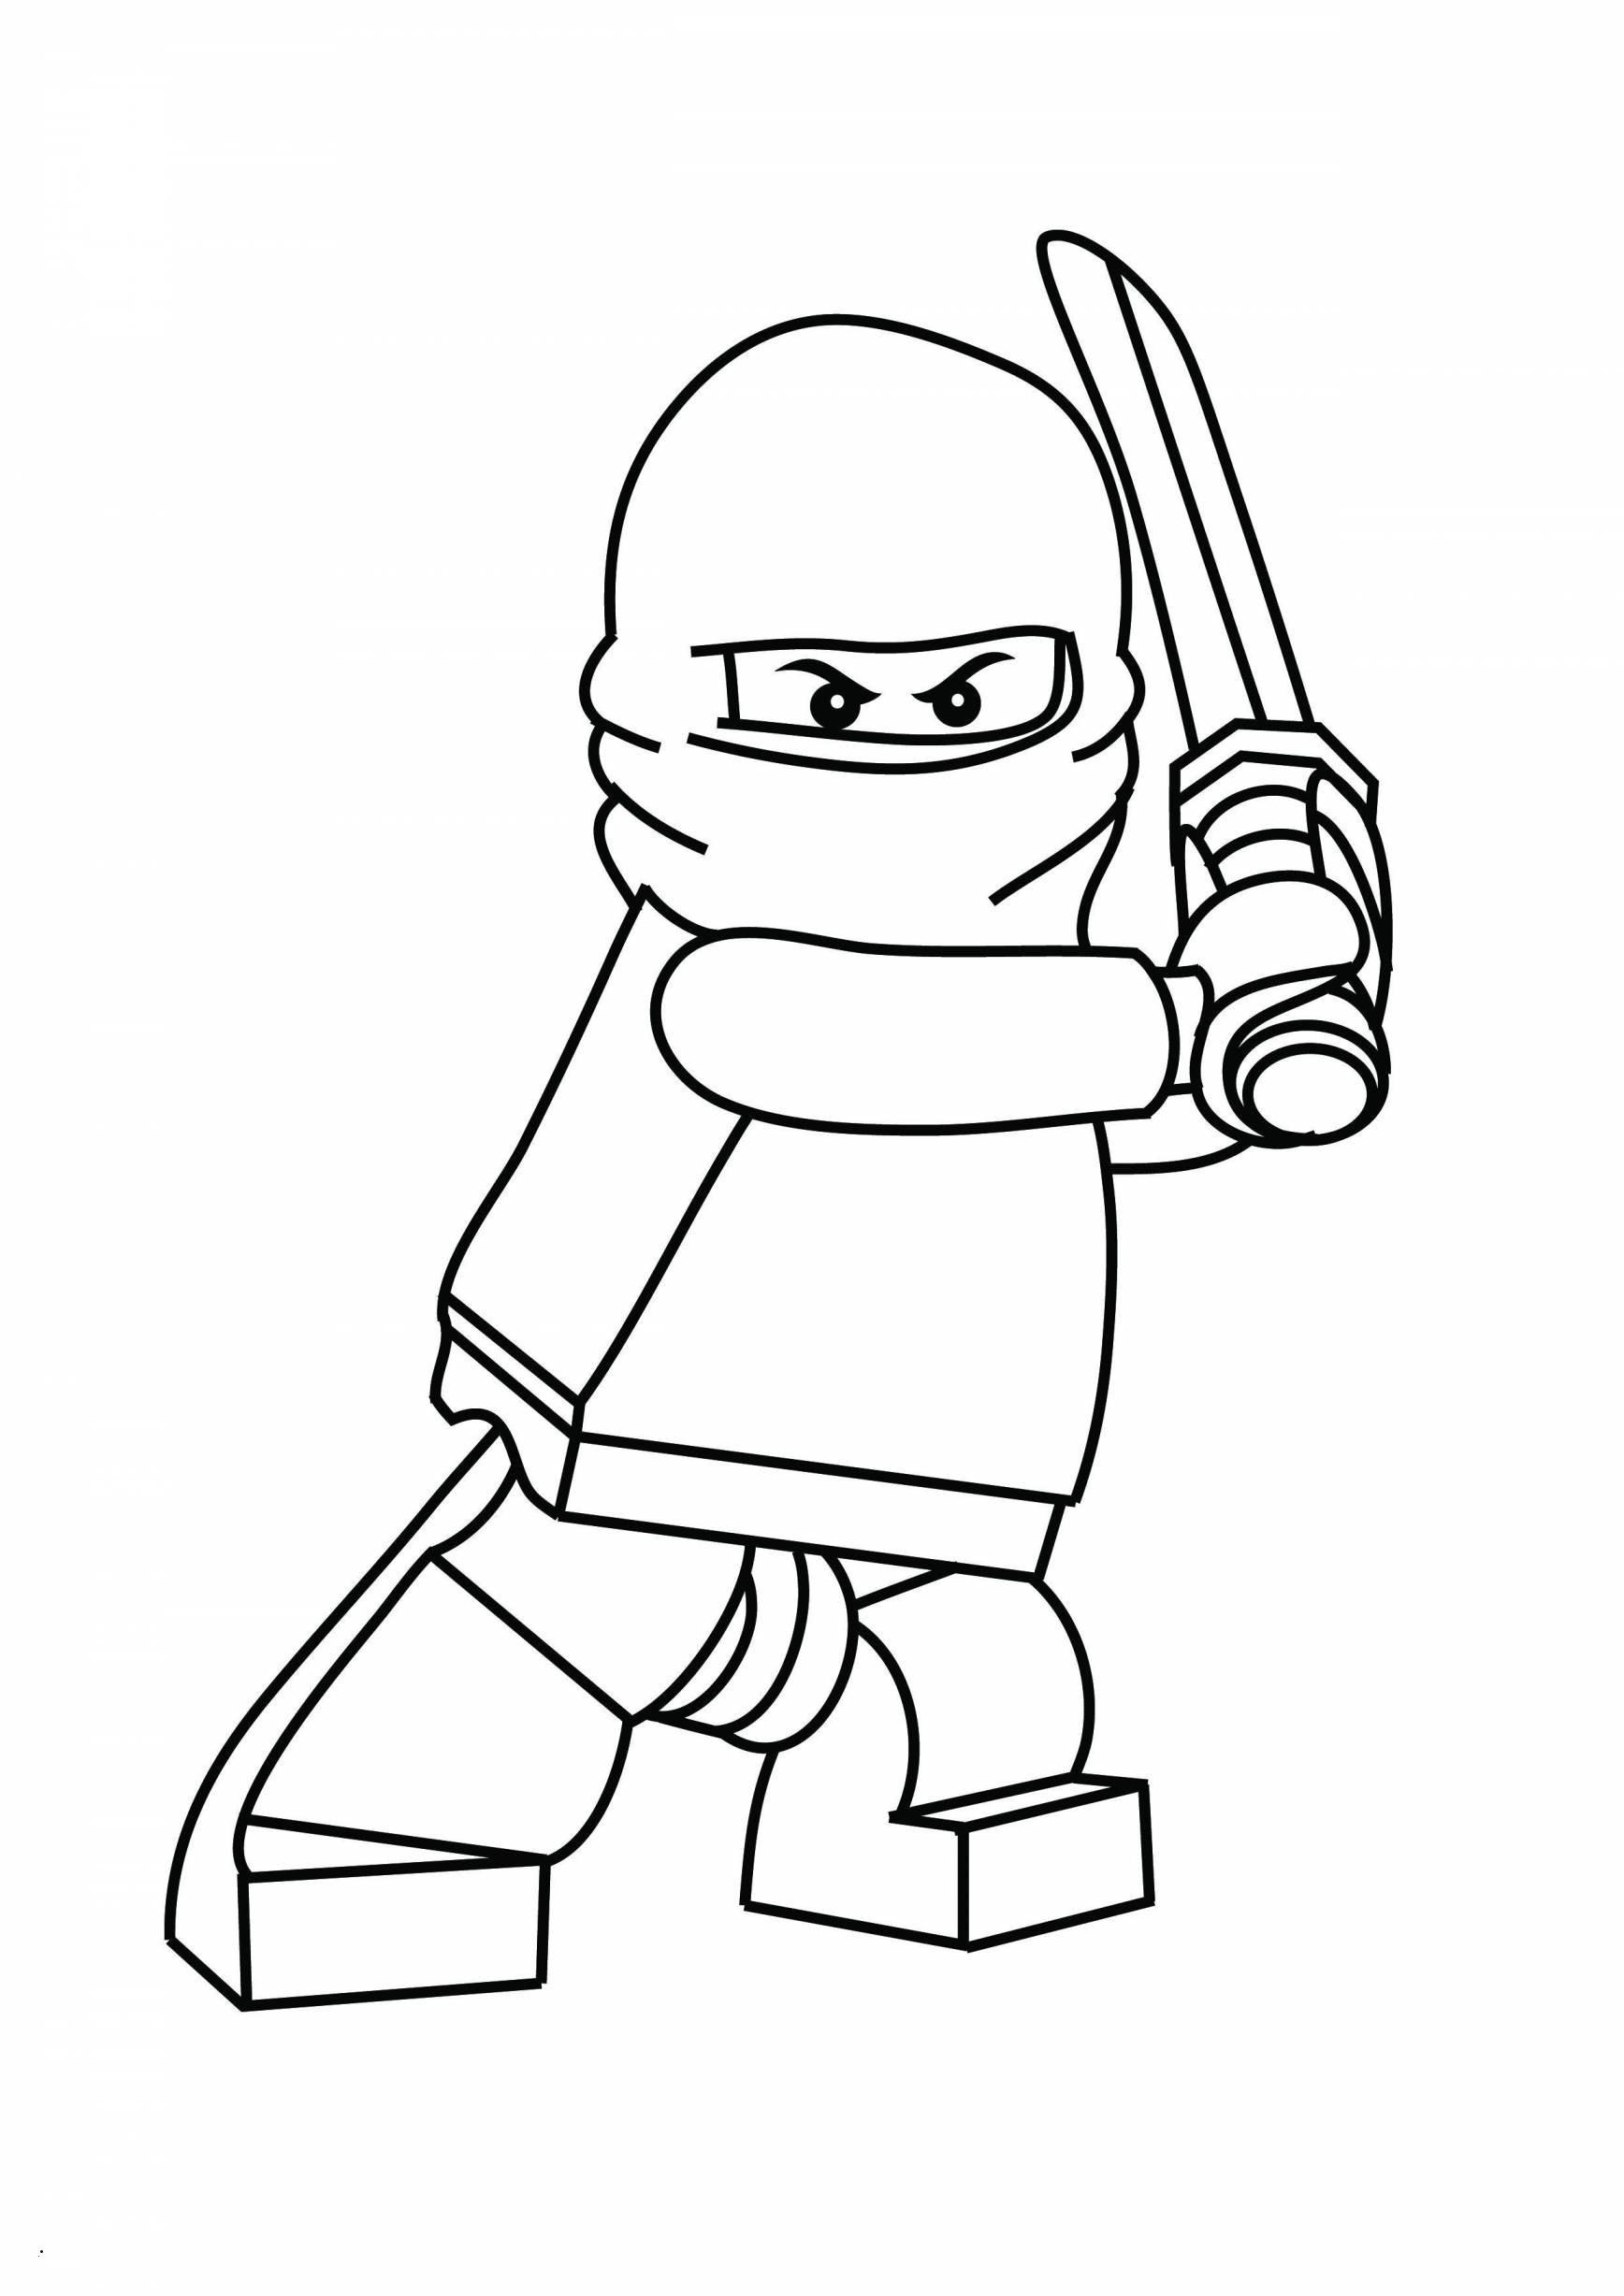 Ninjago Lego Ausmalbilder Neu 48 Motiv Lego Ninjago Ausmalbilder Cole Treehouse Nyc Das Bild